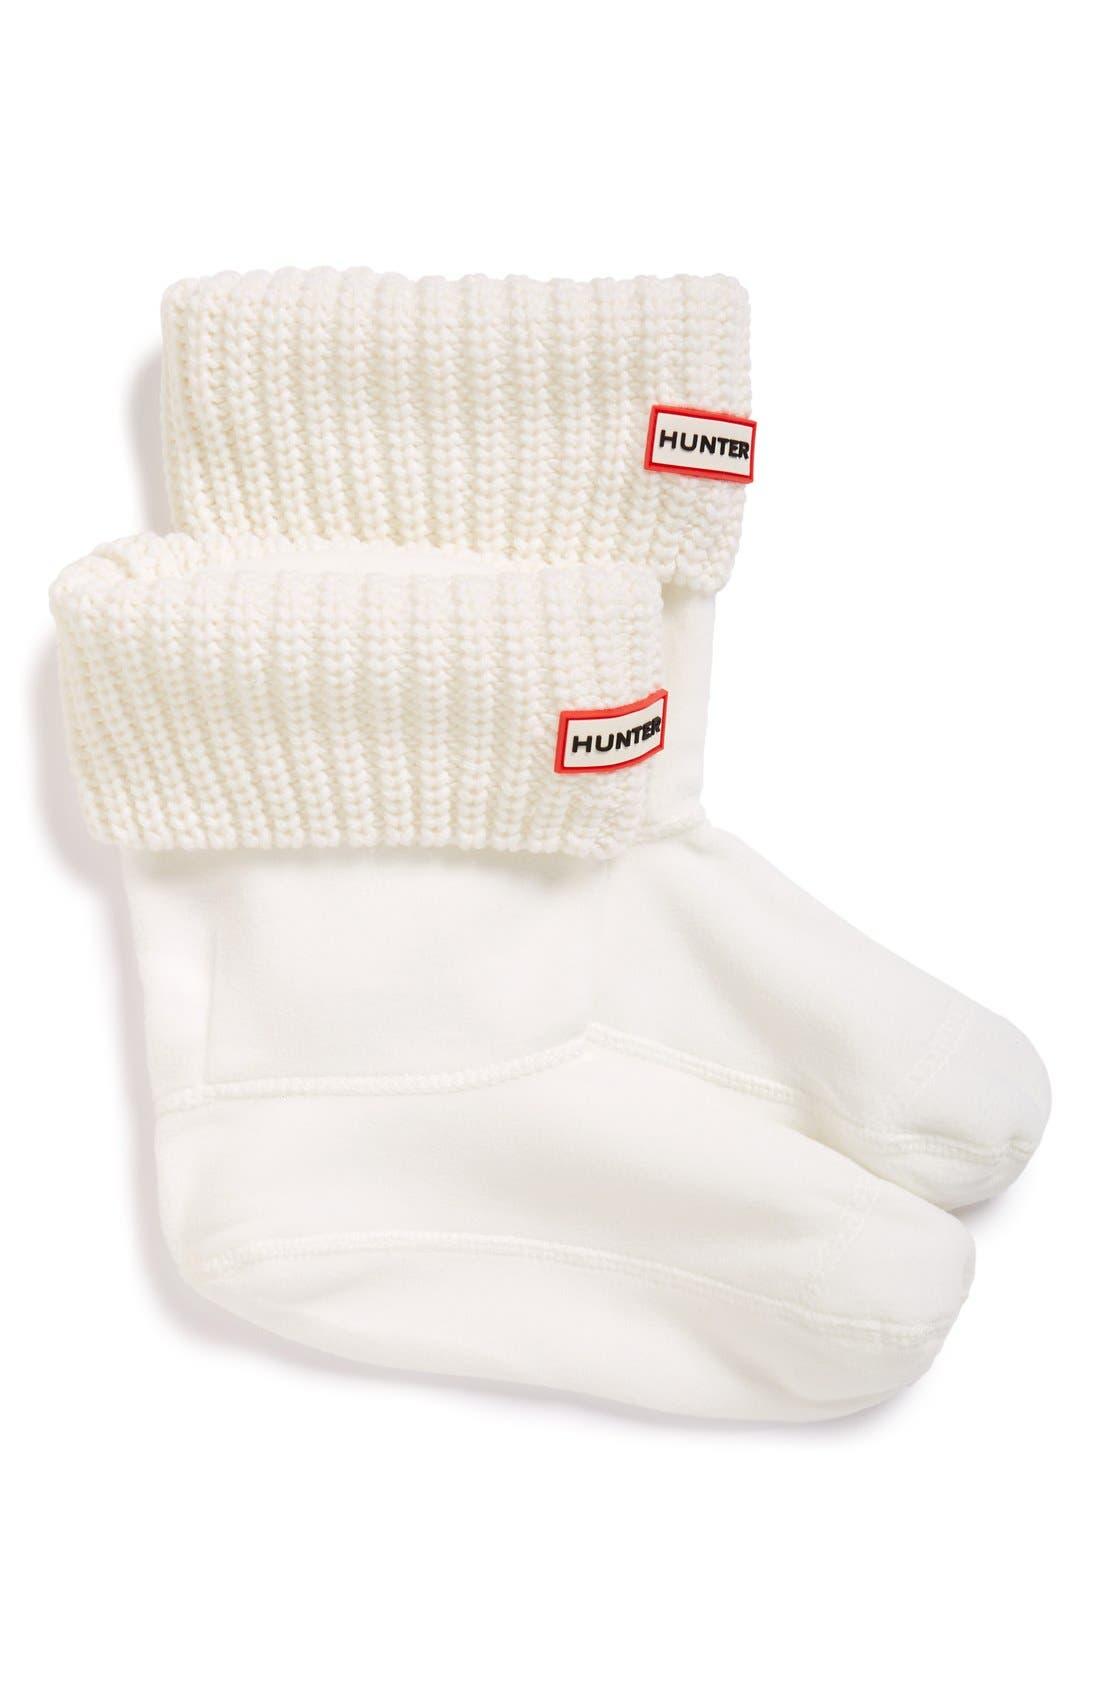 'Half Cardigan' Fleece Boot Socks,                         Main,                         color, White